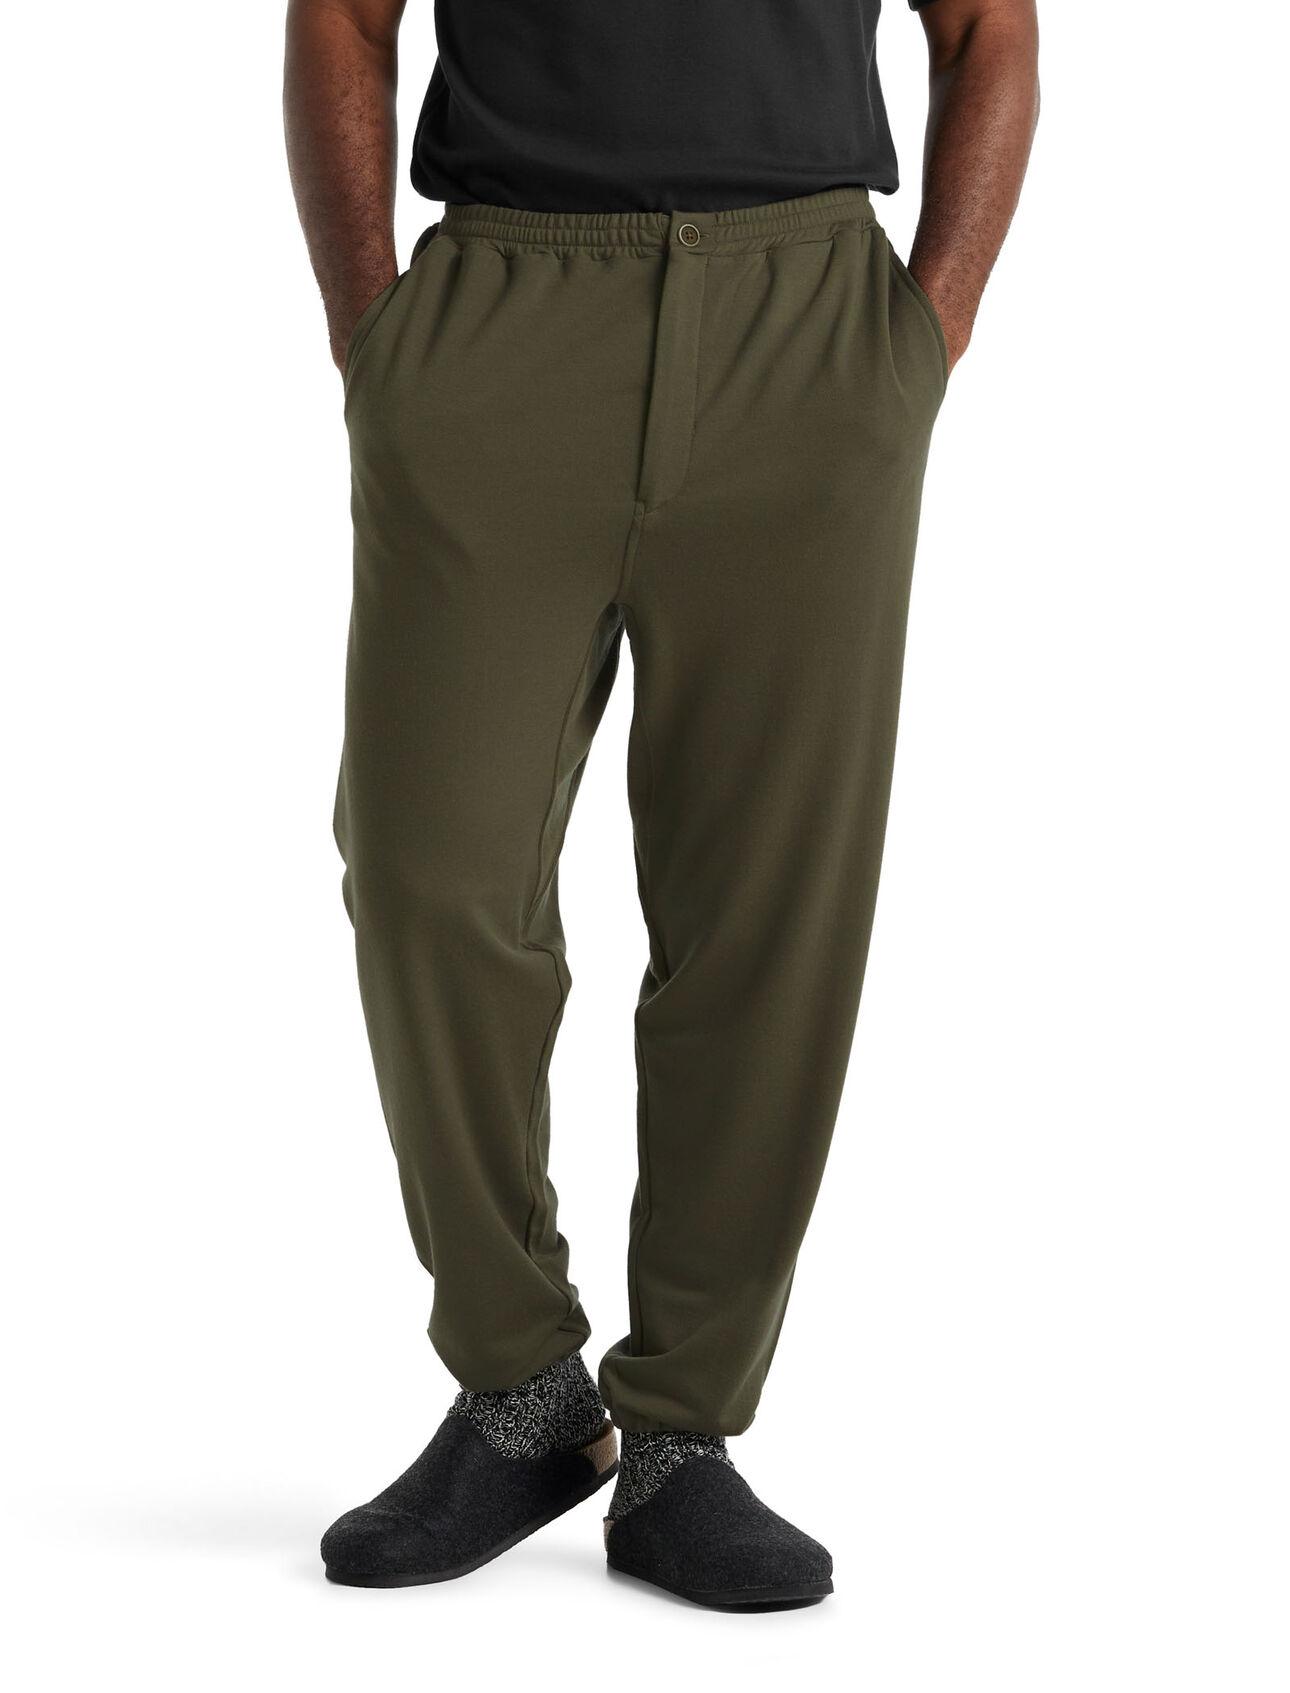 RealFleece™ Merino Dalston Jogger Pants